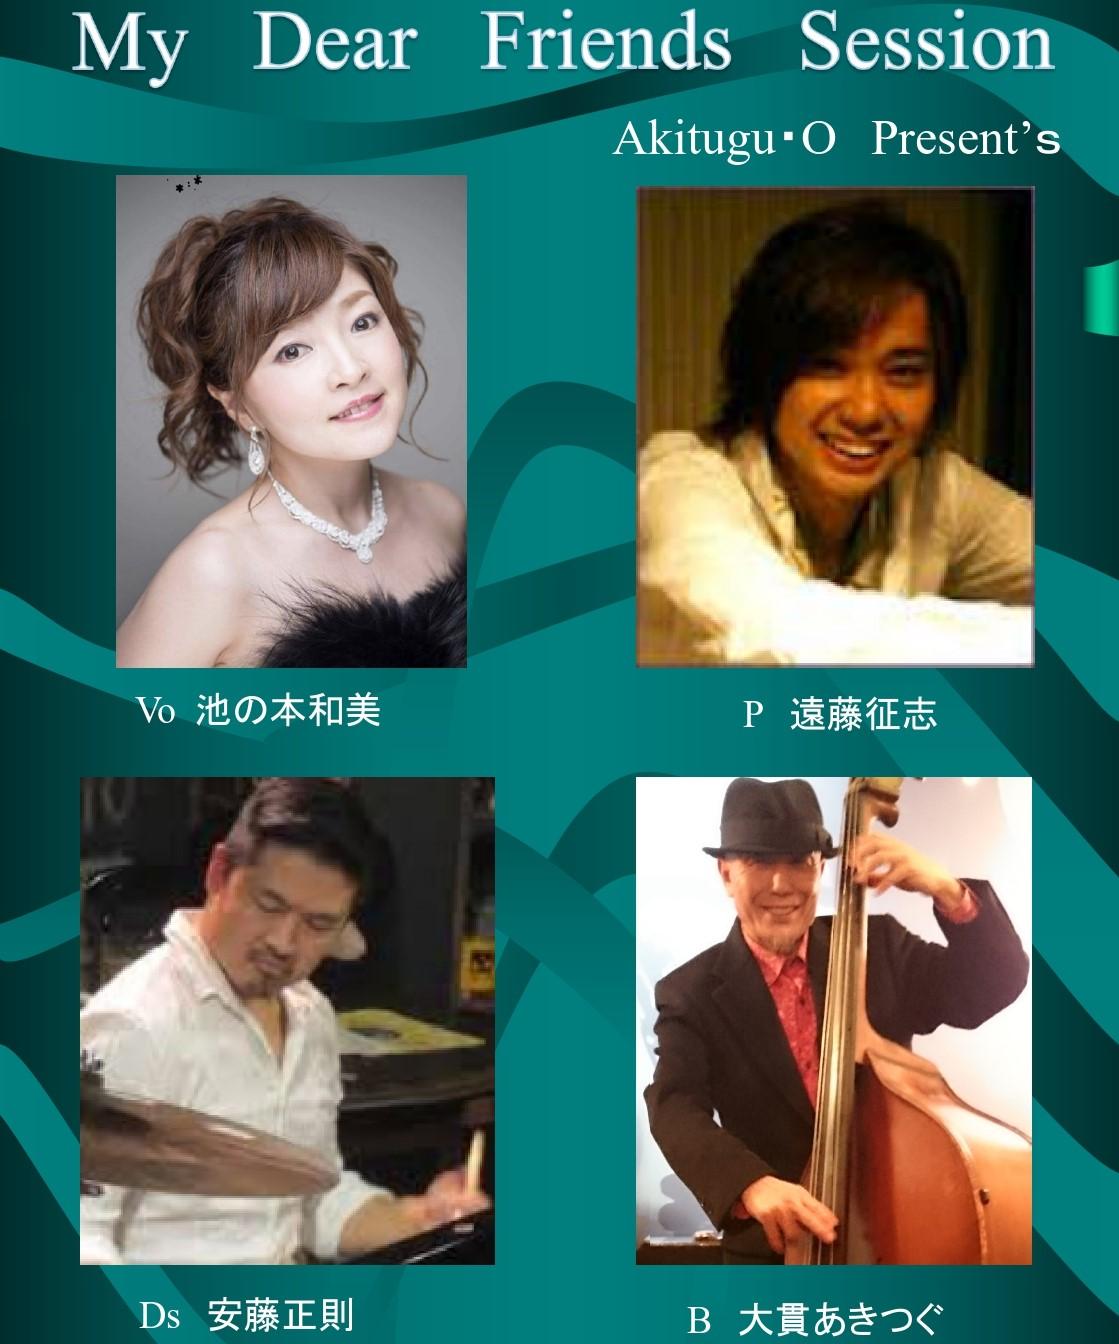 My dear friends session